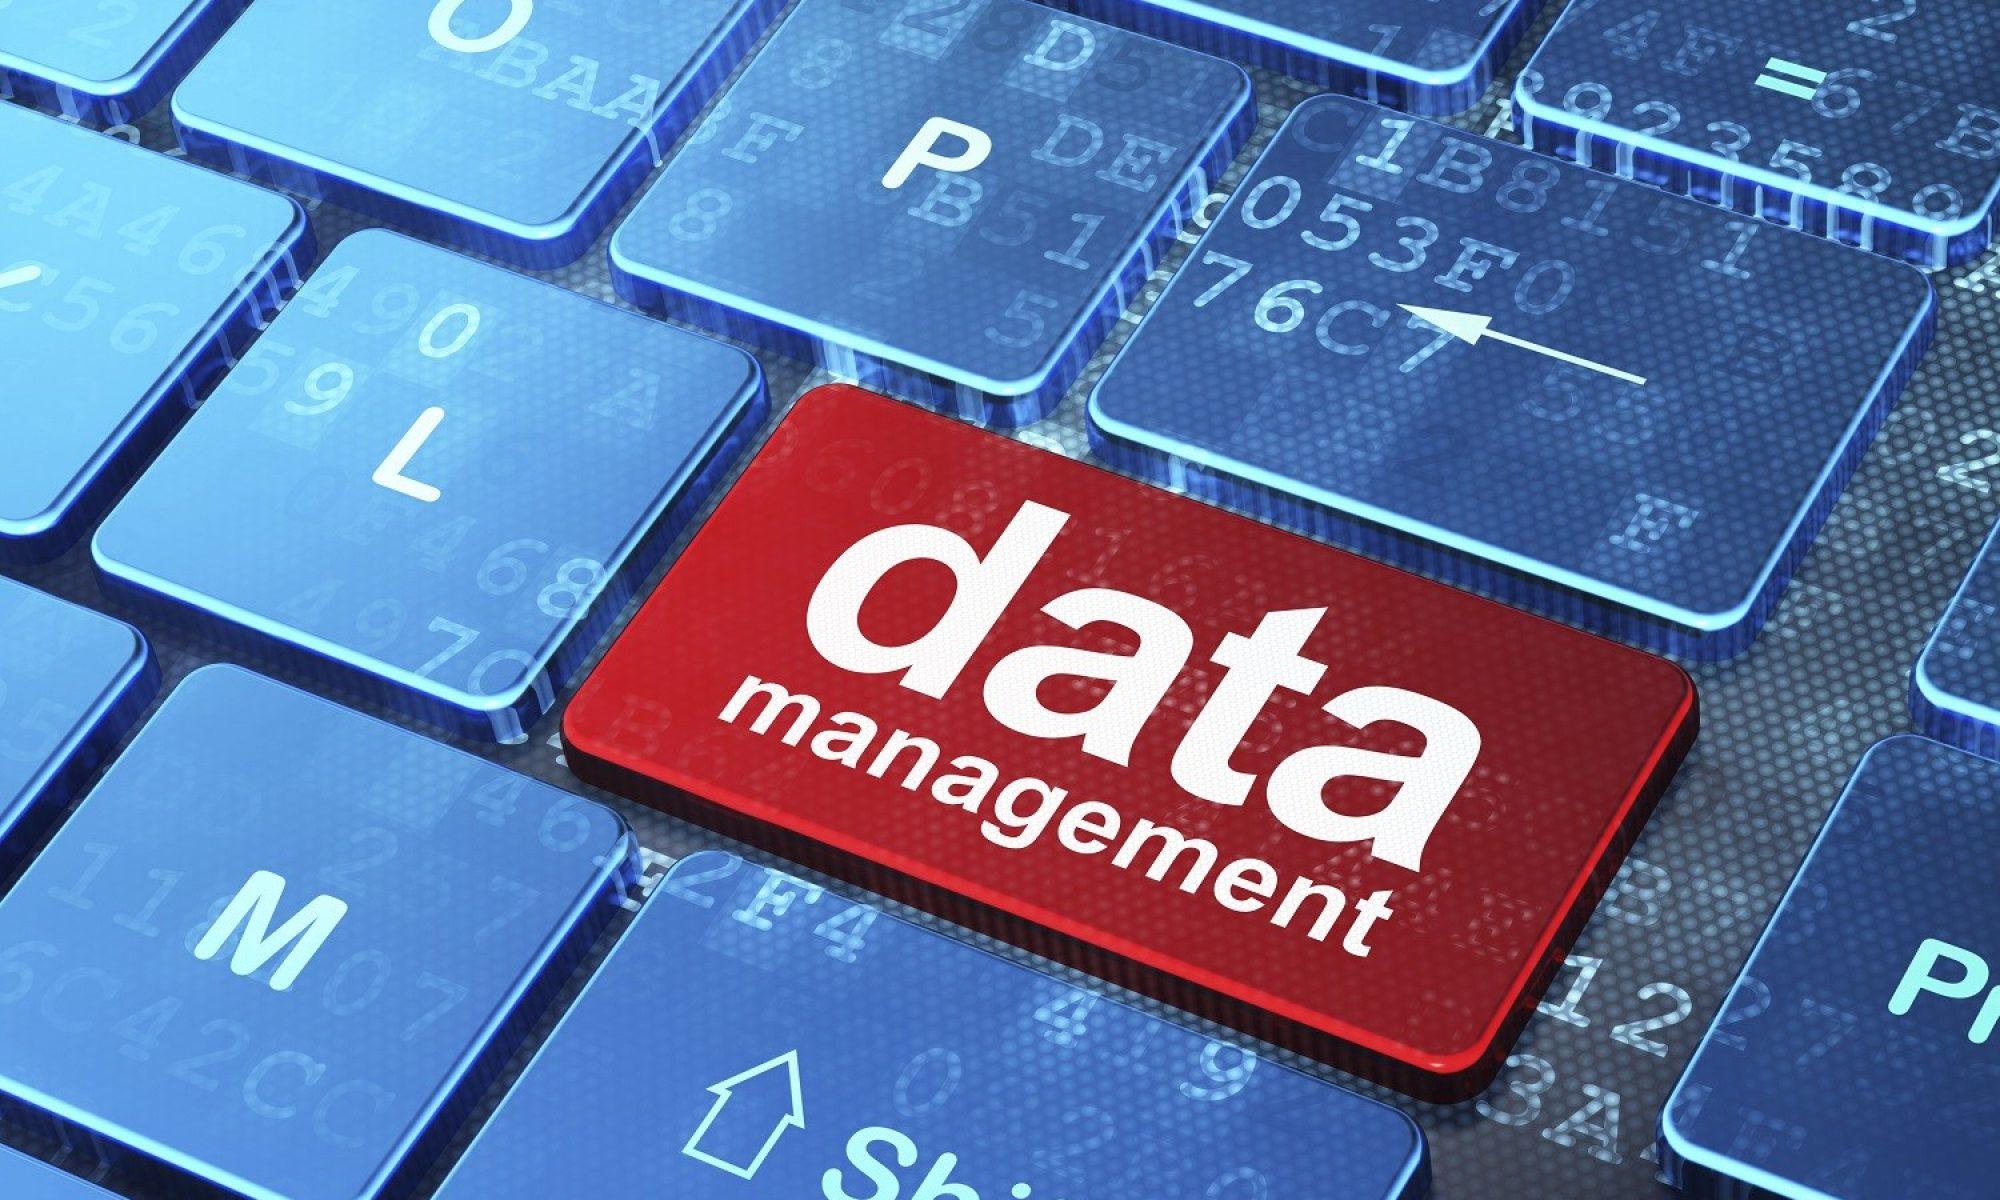 Data Management 2019